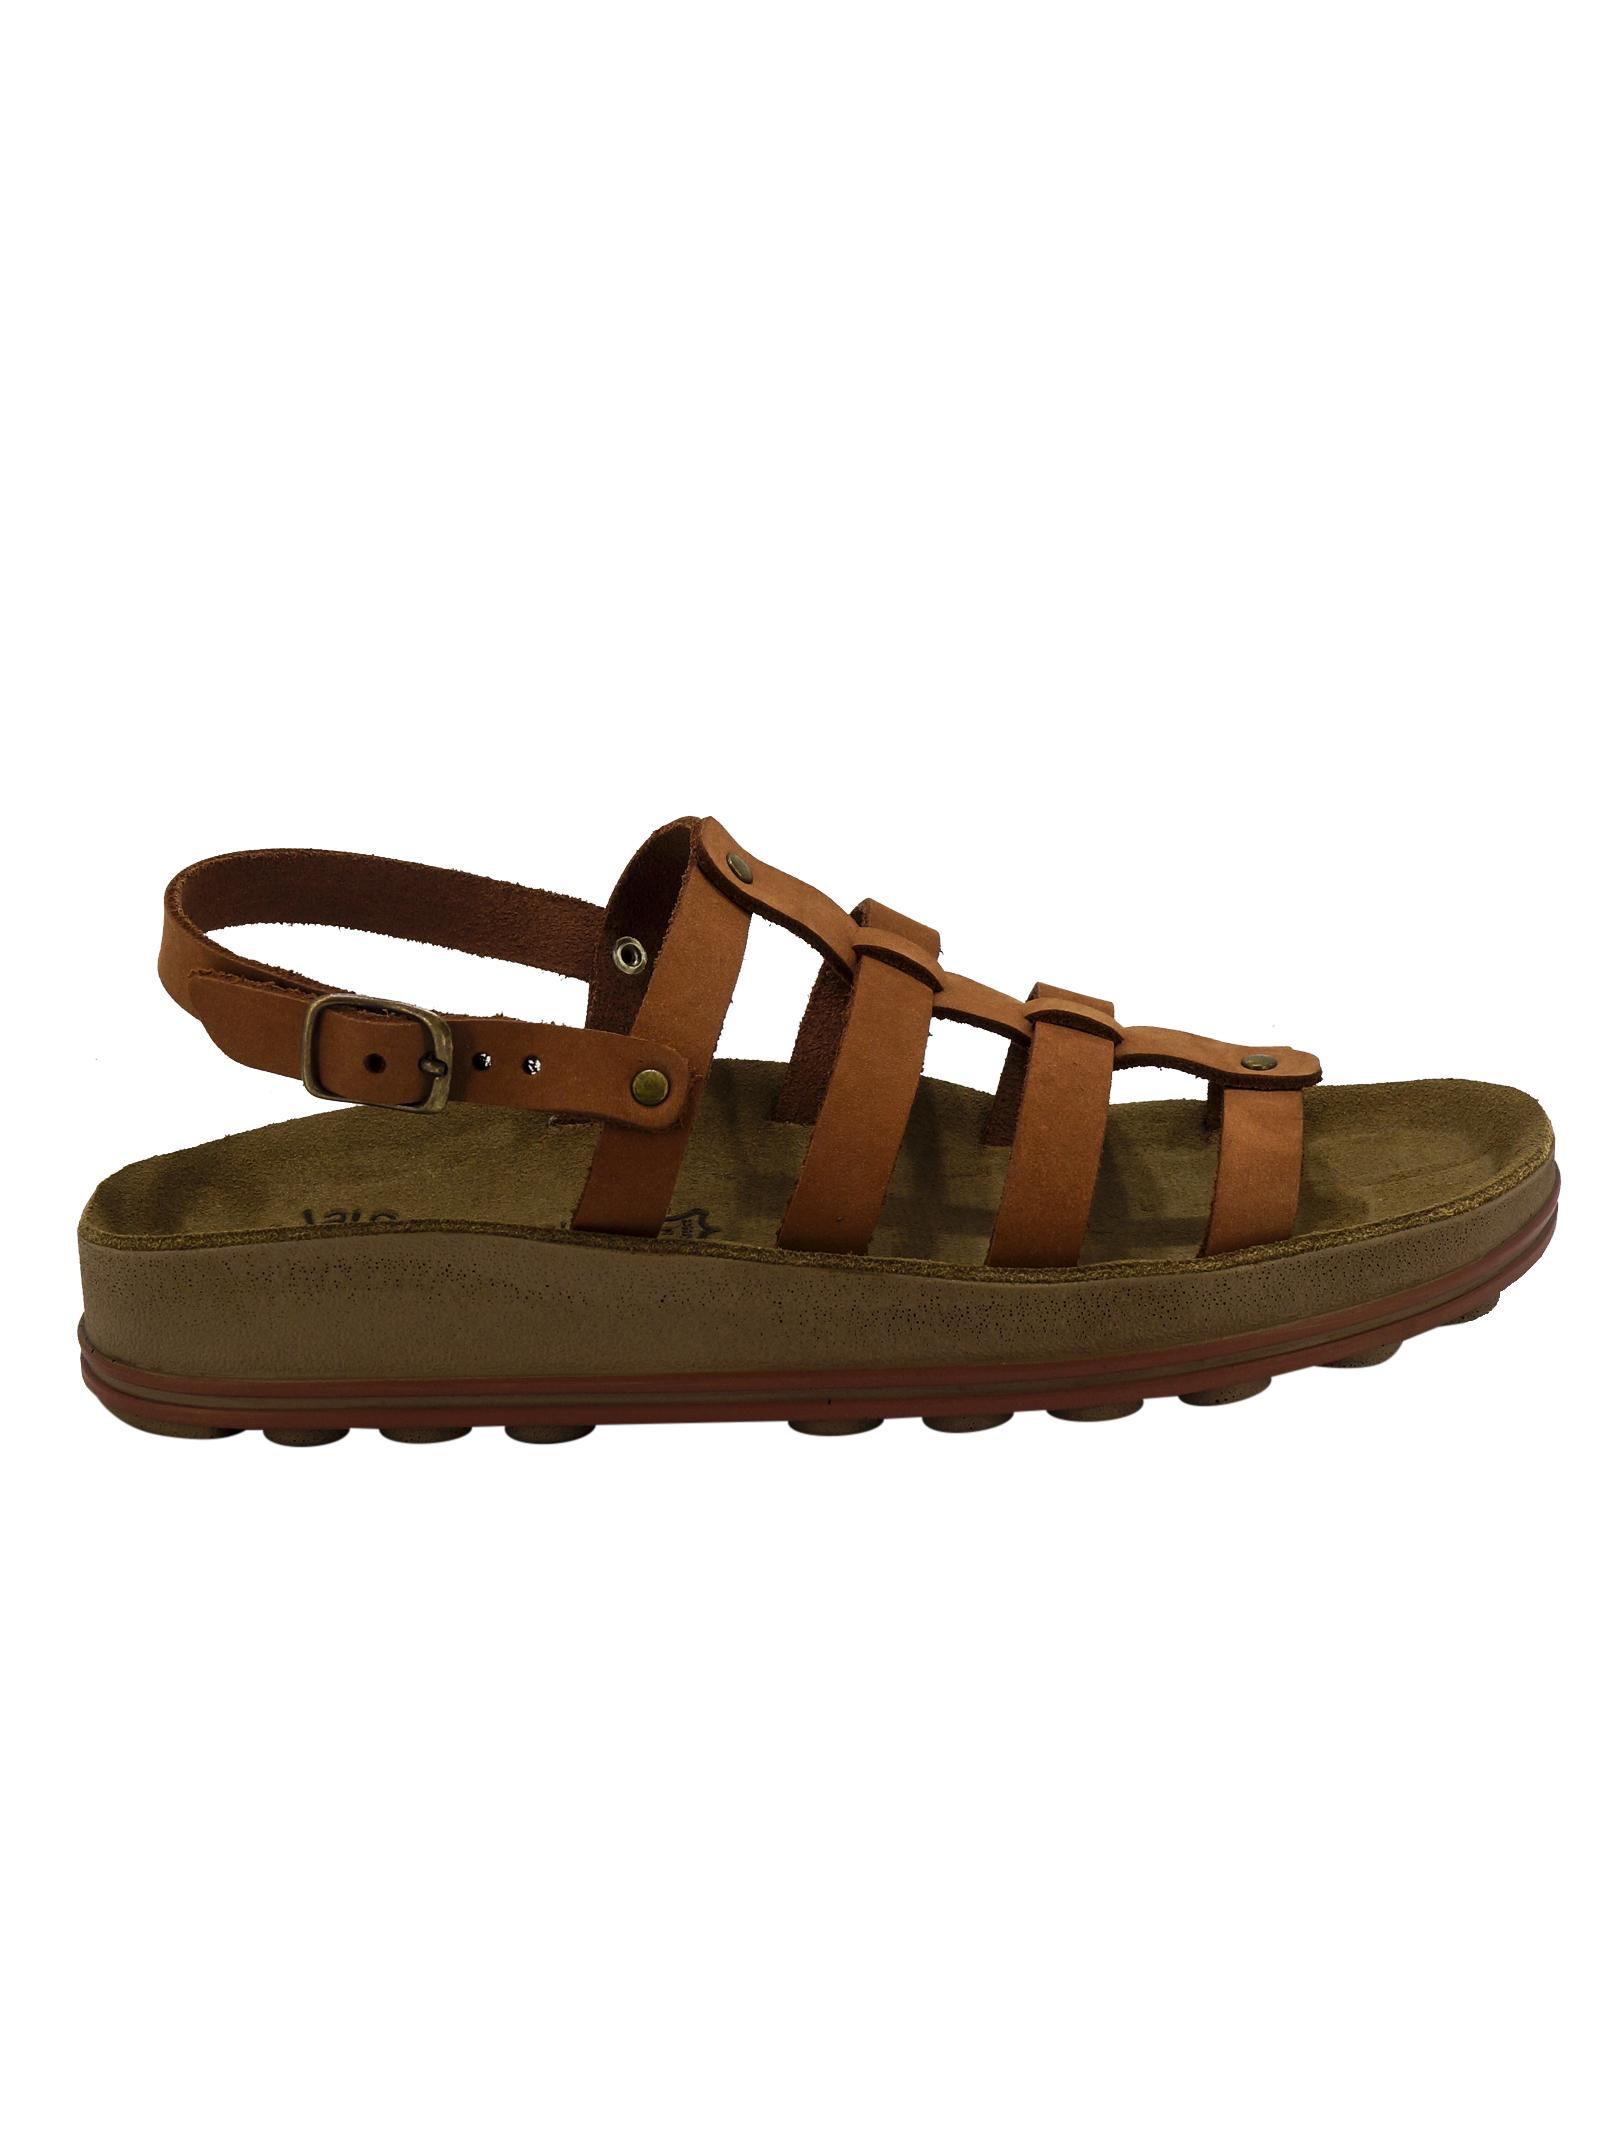 Sandali Donna Plantare Fantasy Sandals FANTASY SANDALS   Sandali   S318ARAGOSTA